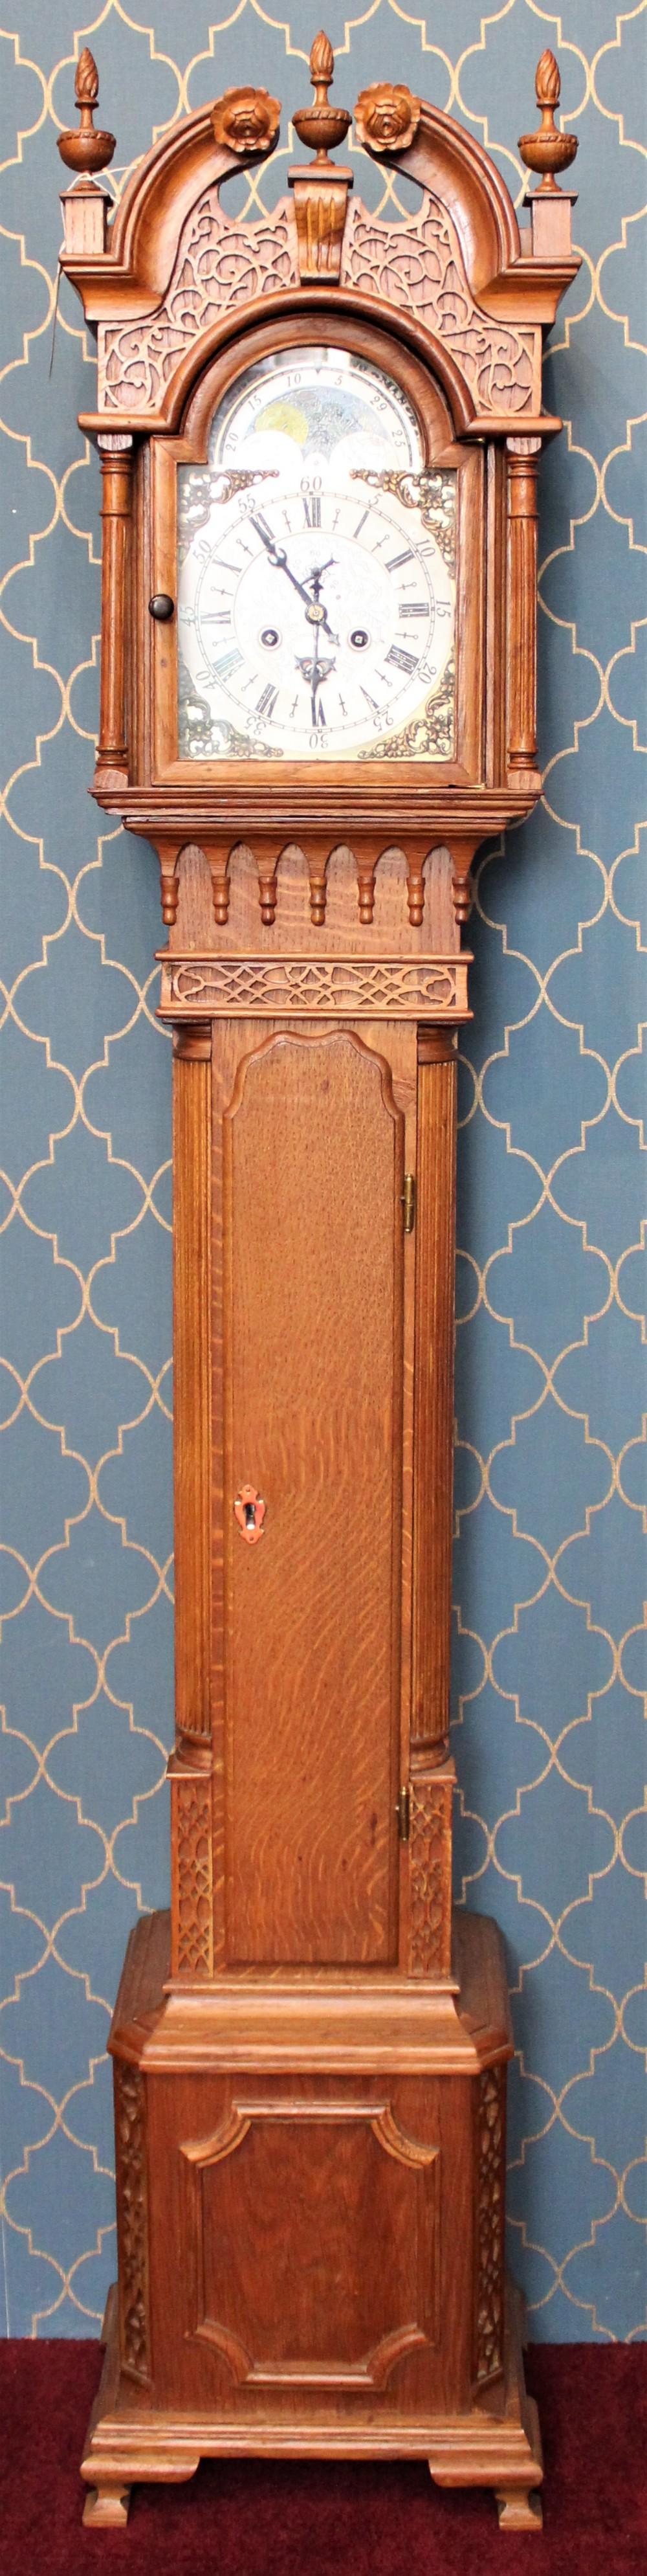 8 day oak cased brass dial grandmother clock